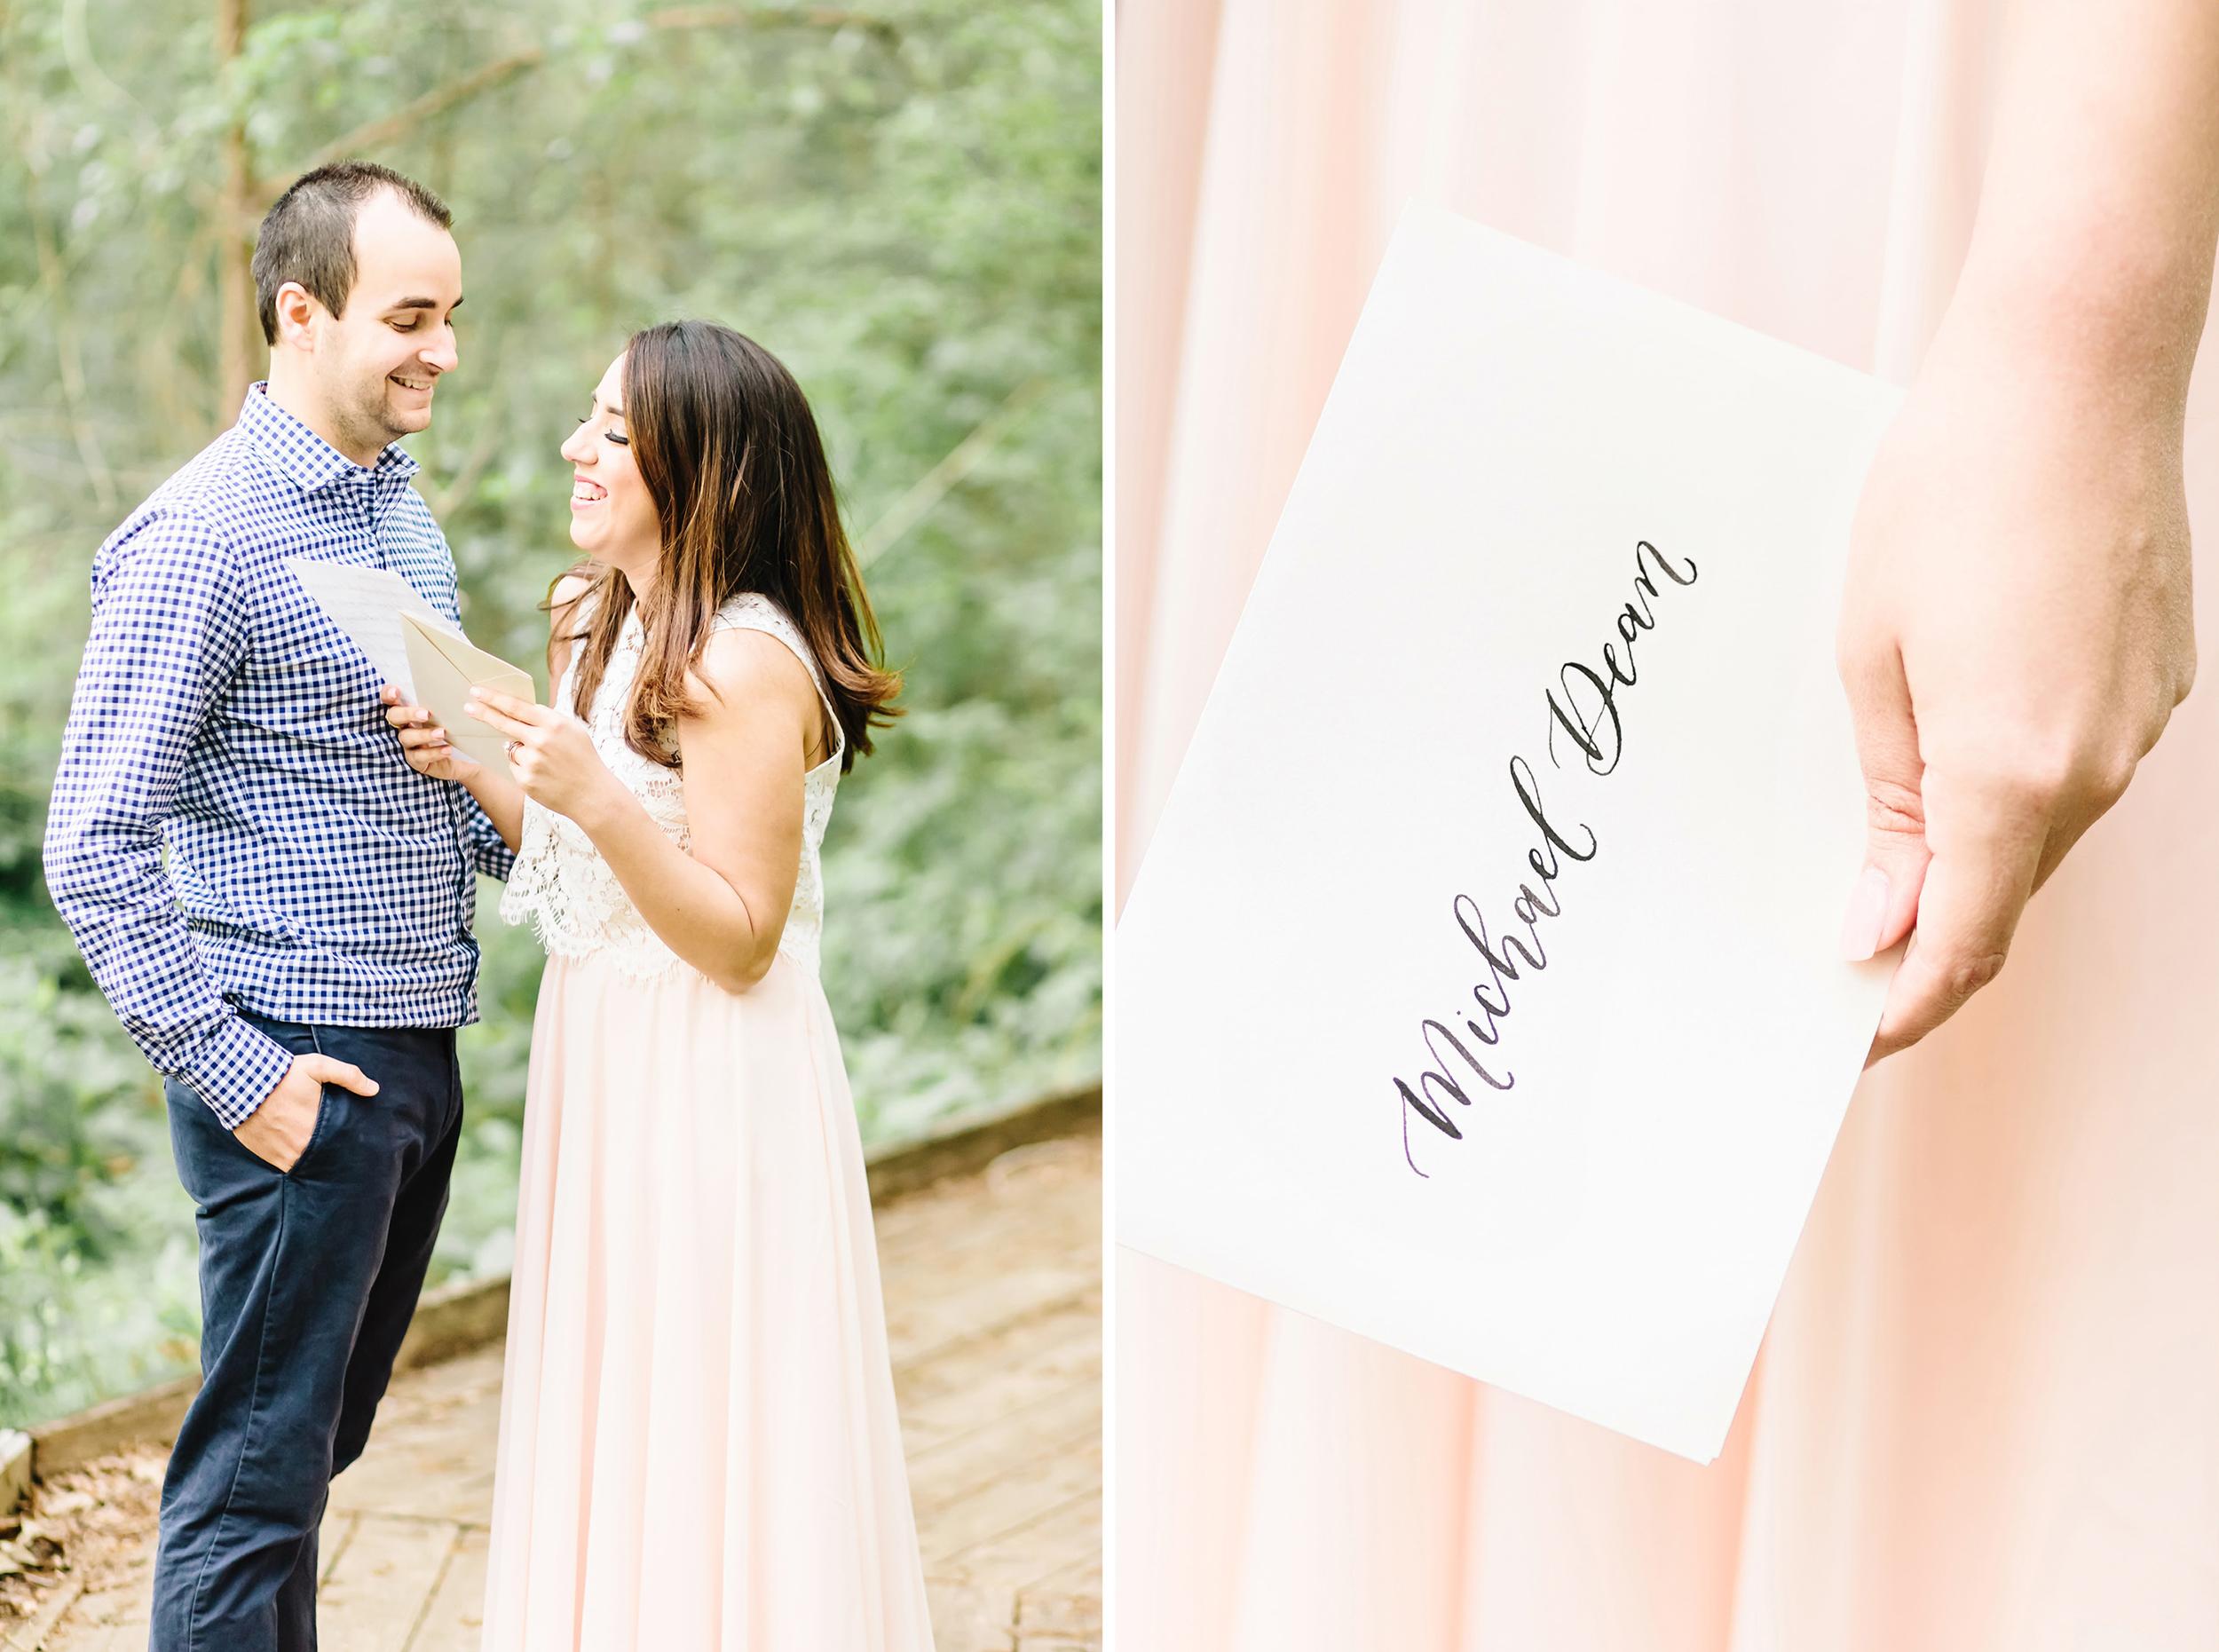 Cassie Schott Photography_Houston Couple Photography_Love Letter Session_2.jpg